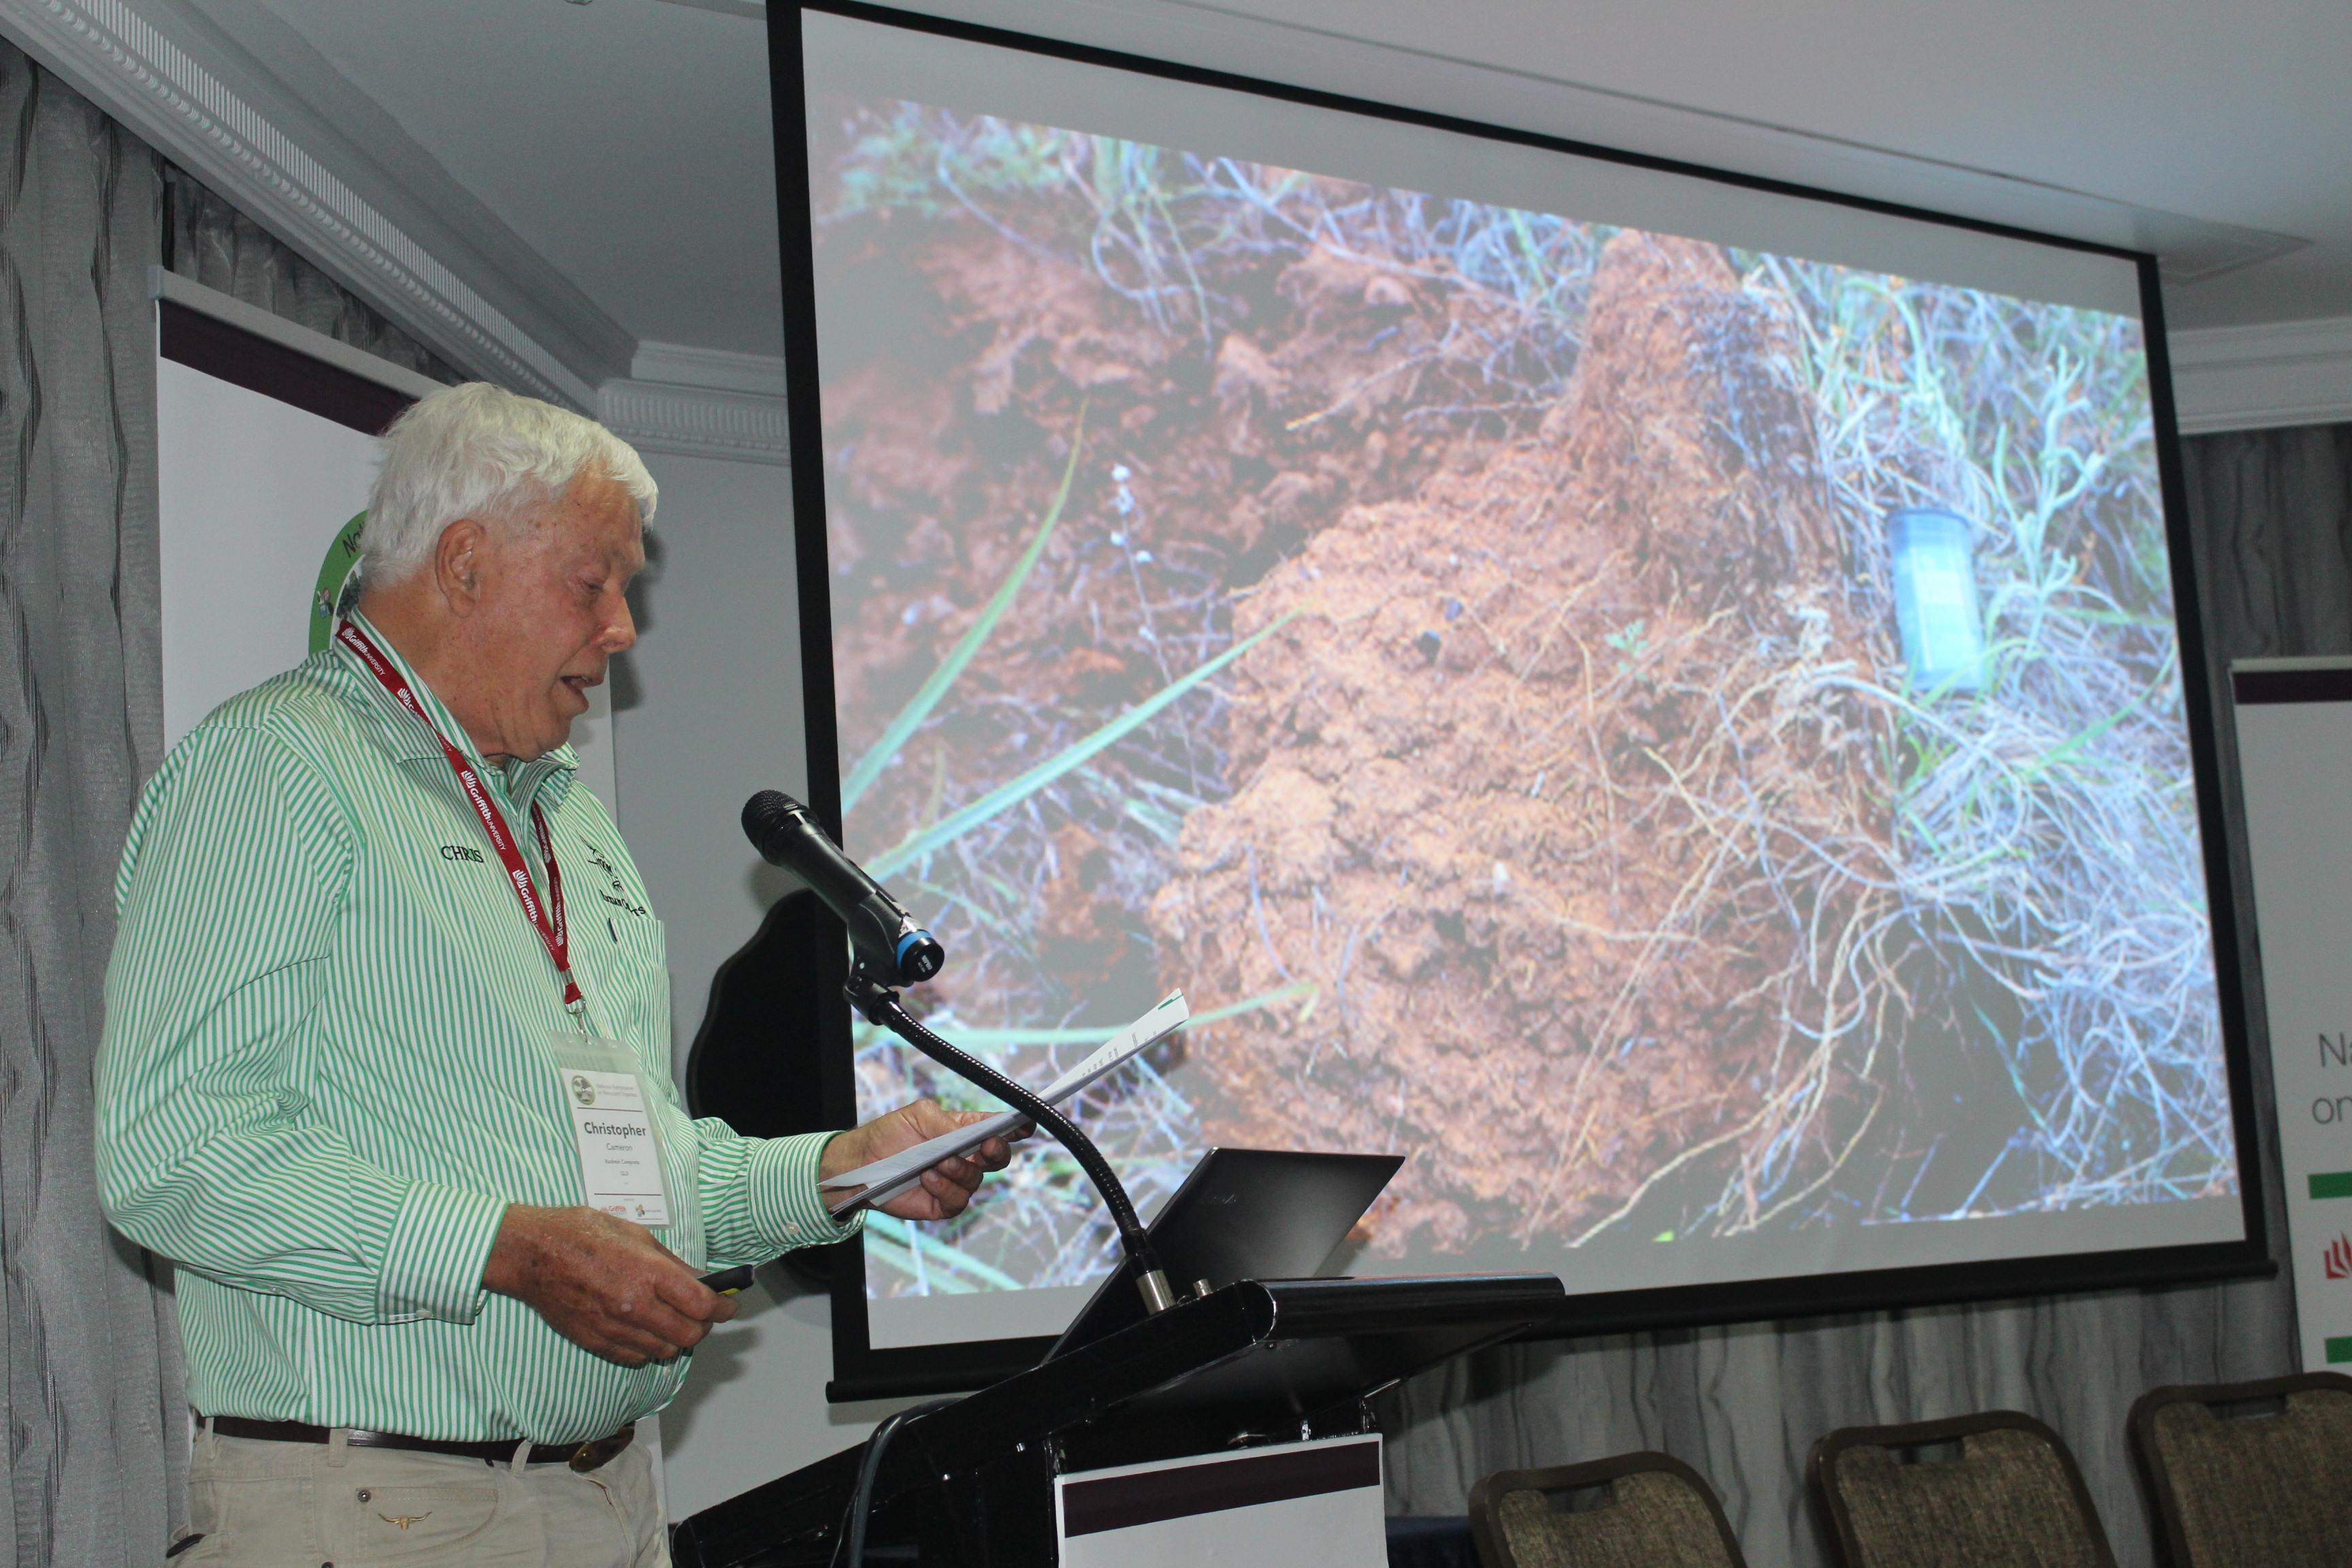 Christopher Cameron, Rockmin Composts